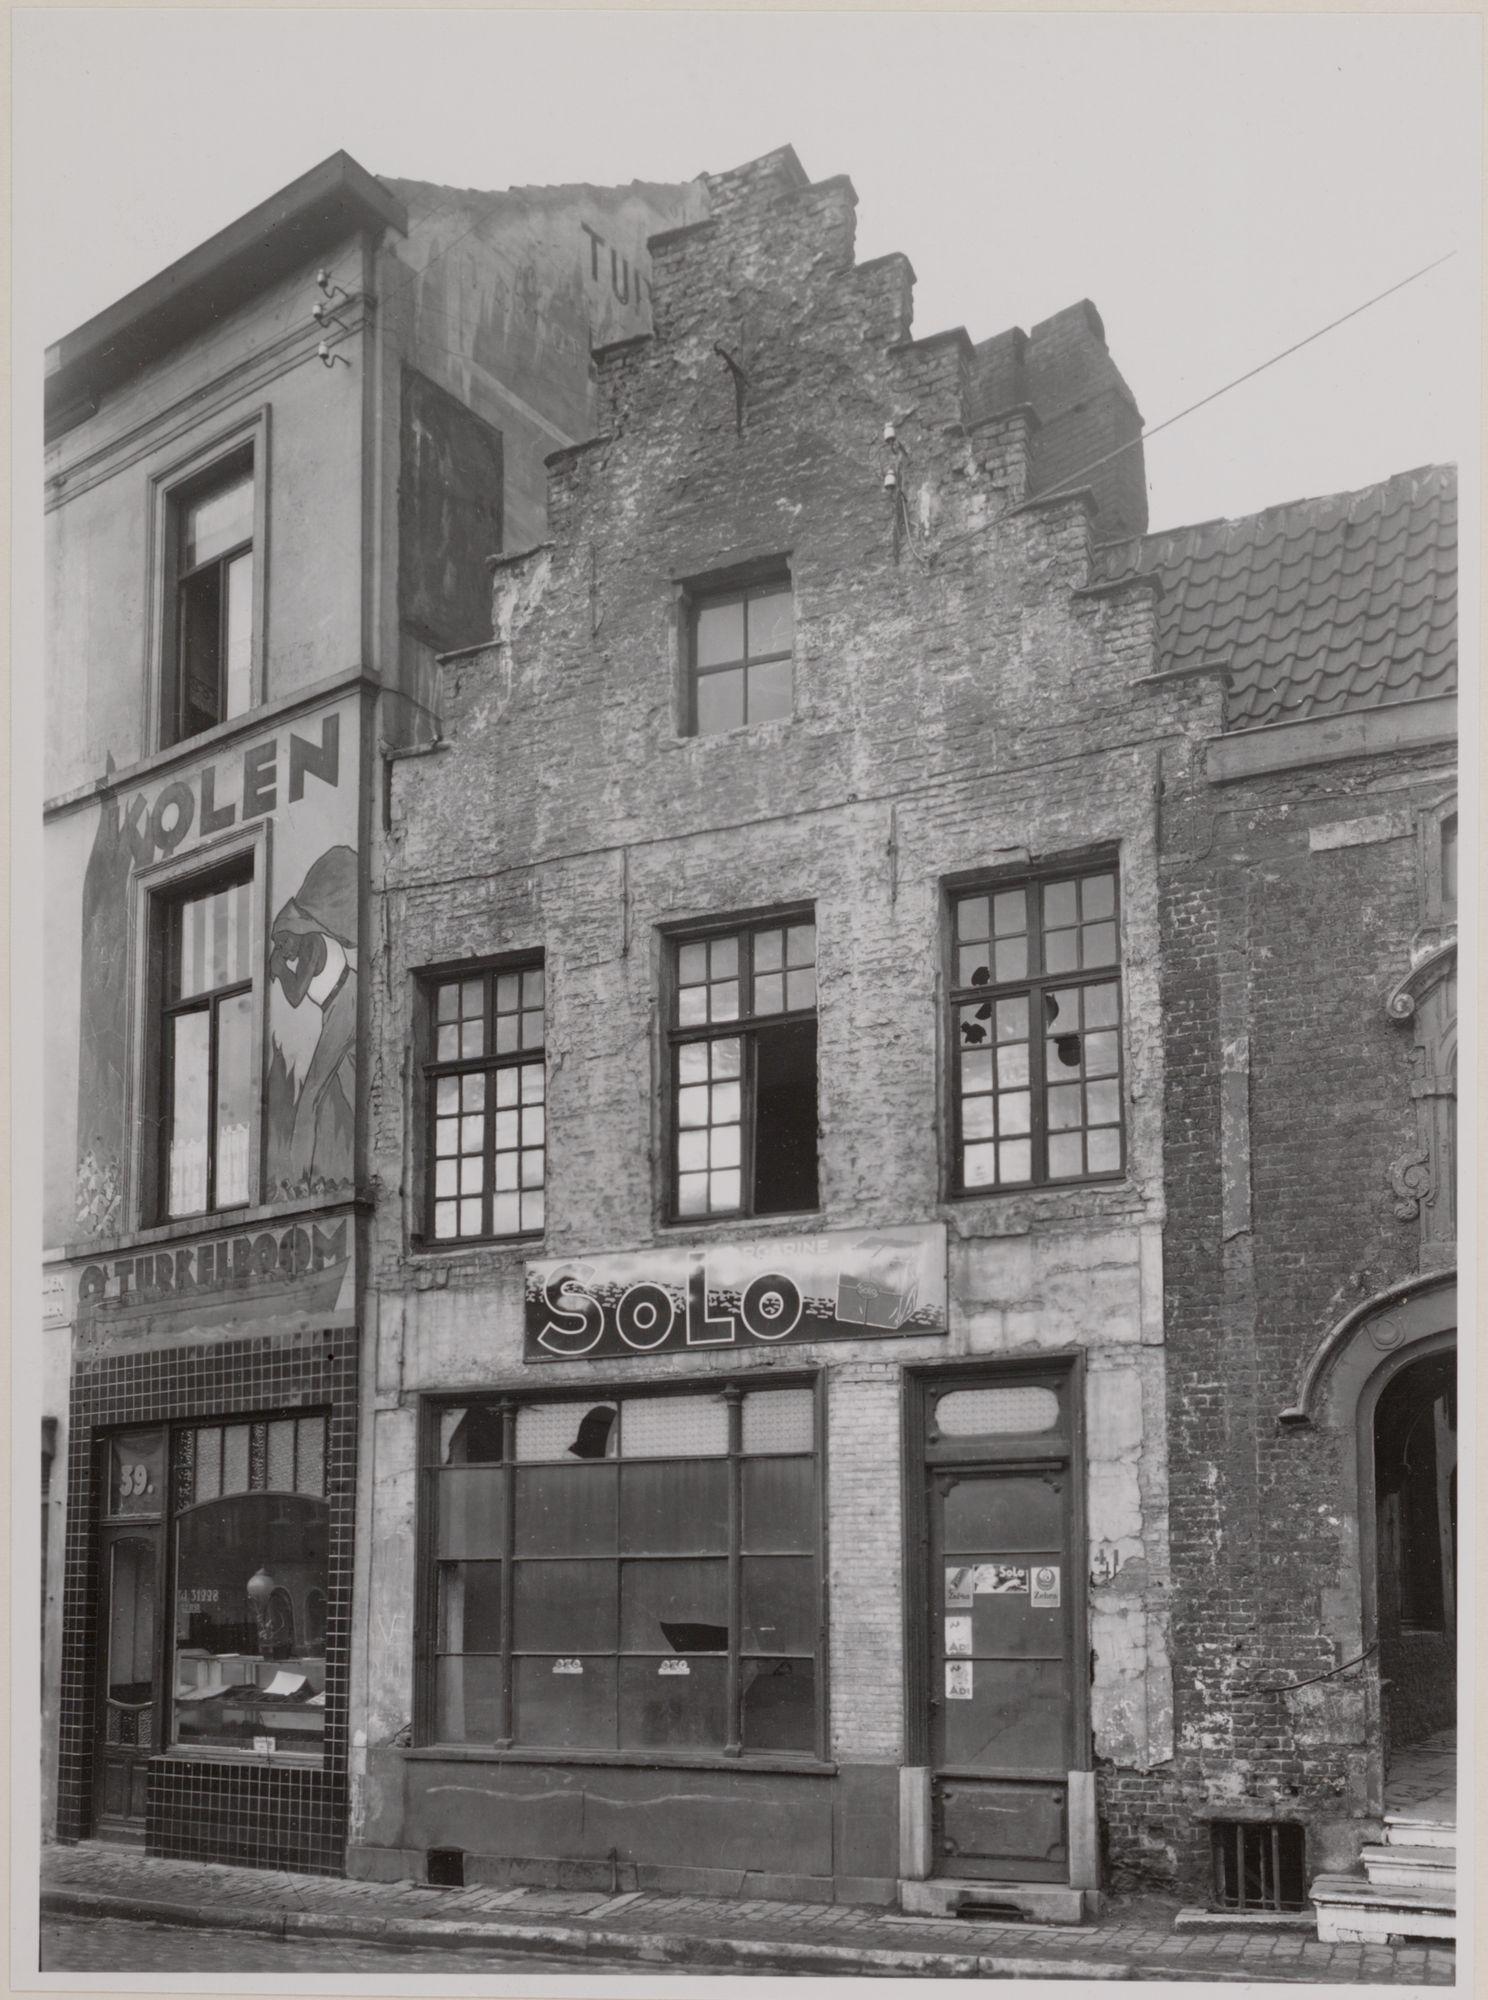 Gent: Trapgevelhuis, Kraanlei